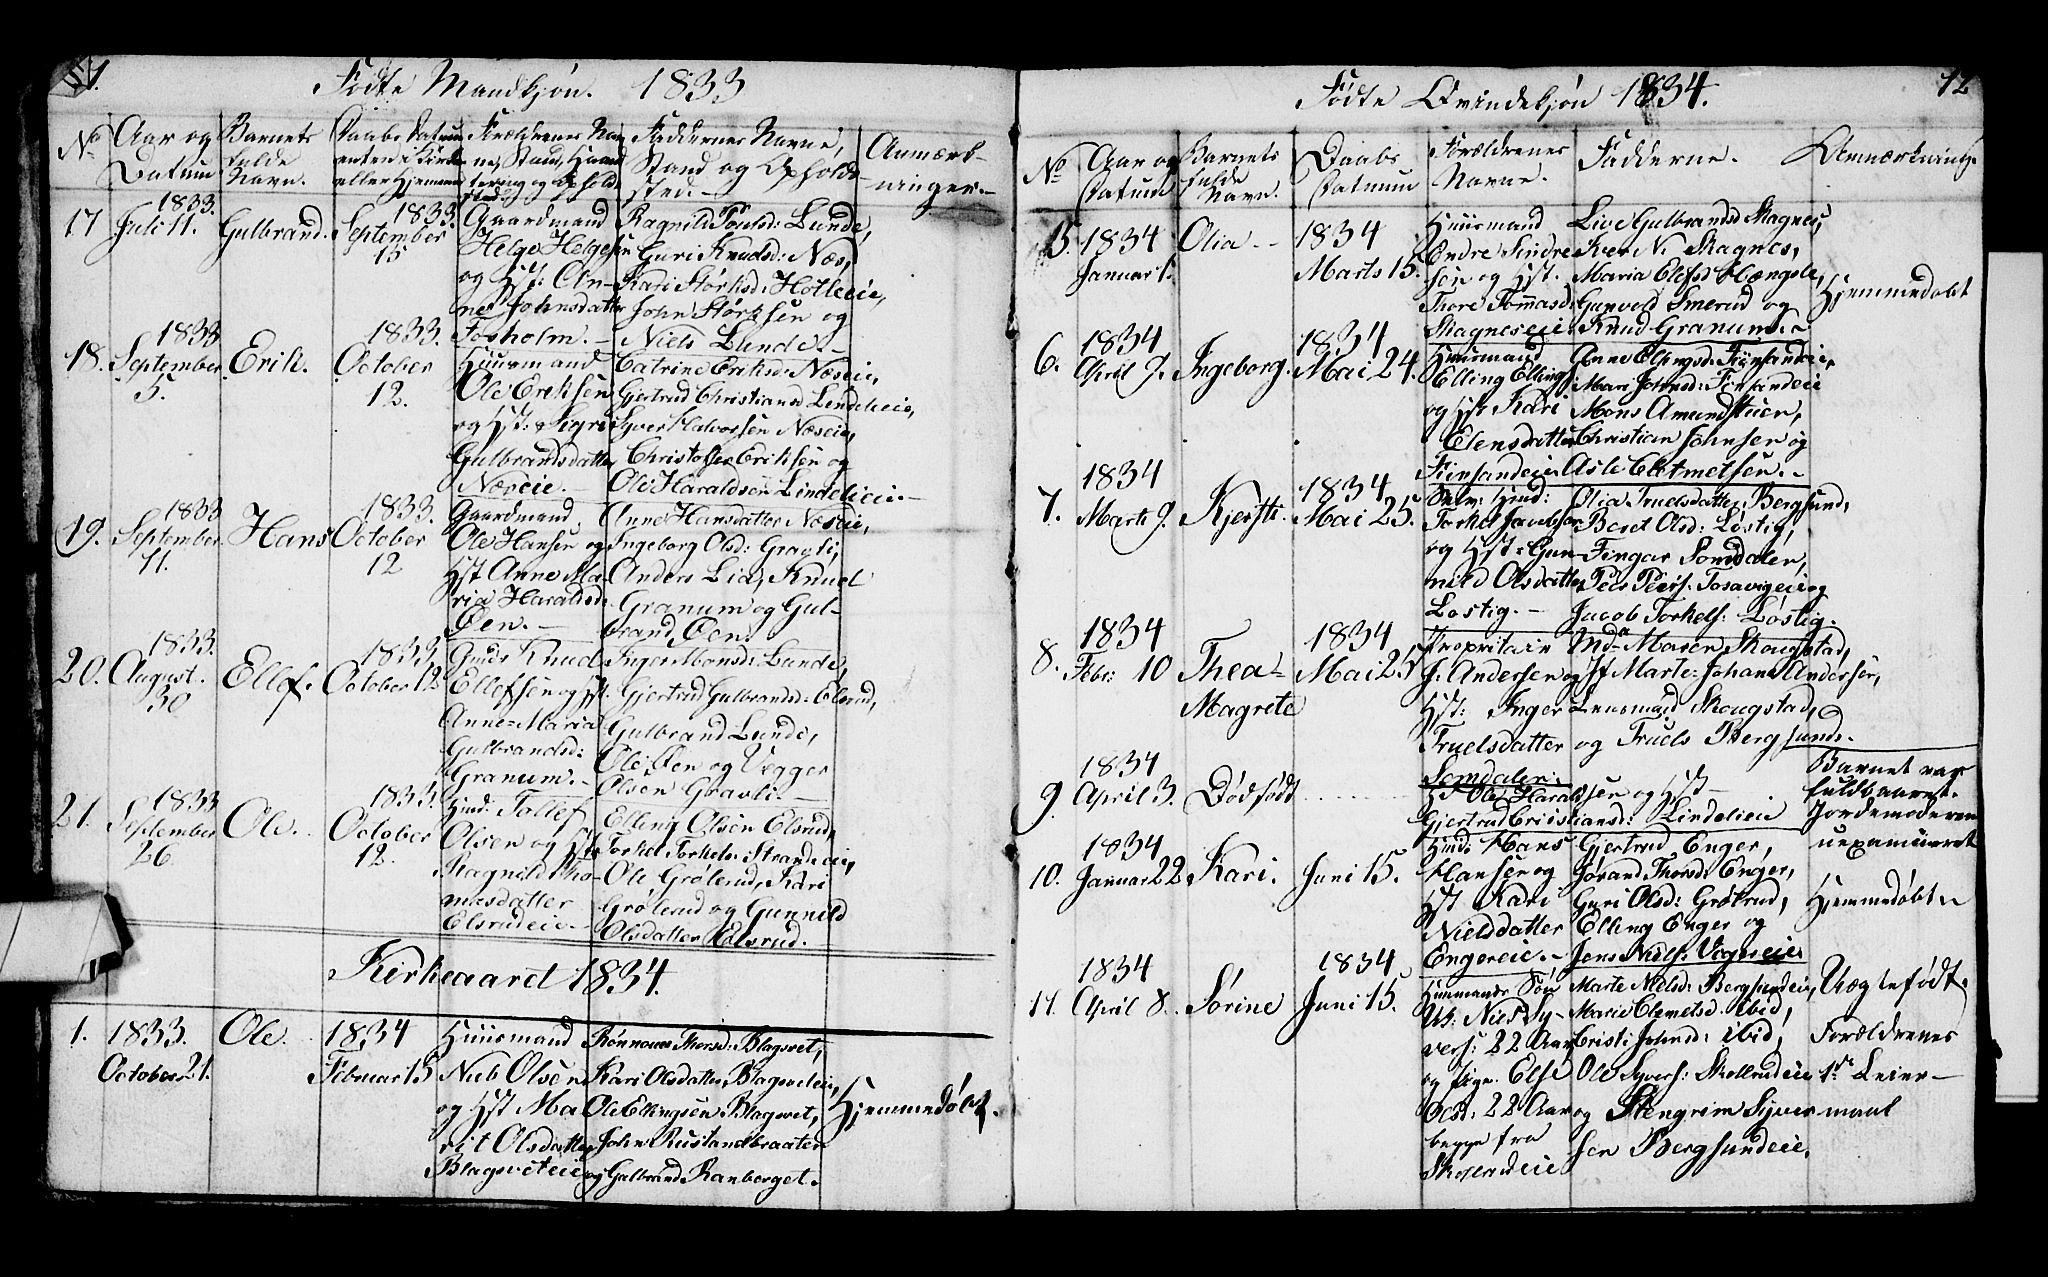 SAKO, Ådal kirkebøker, G/Ga/L0001: Klokkerbok nr. I 1, 1832-1840, s. 11-12